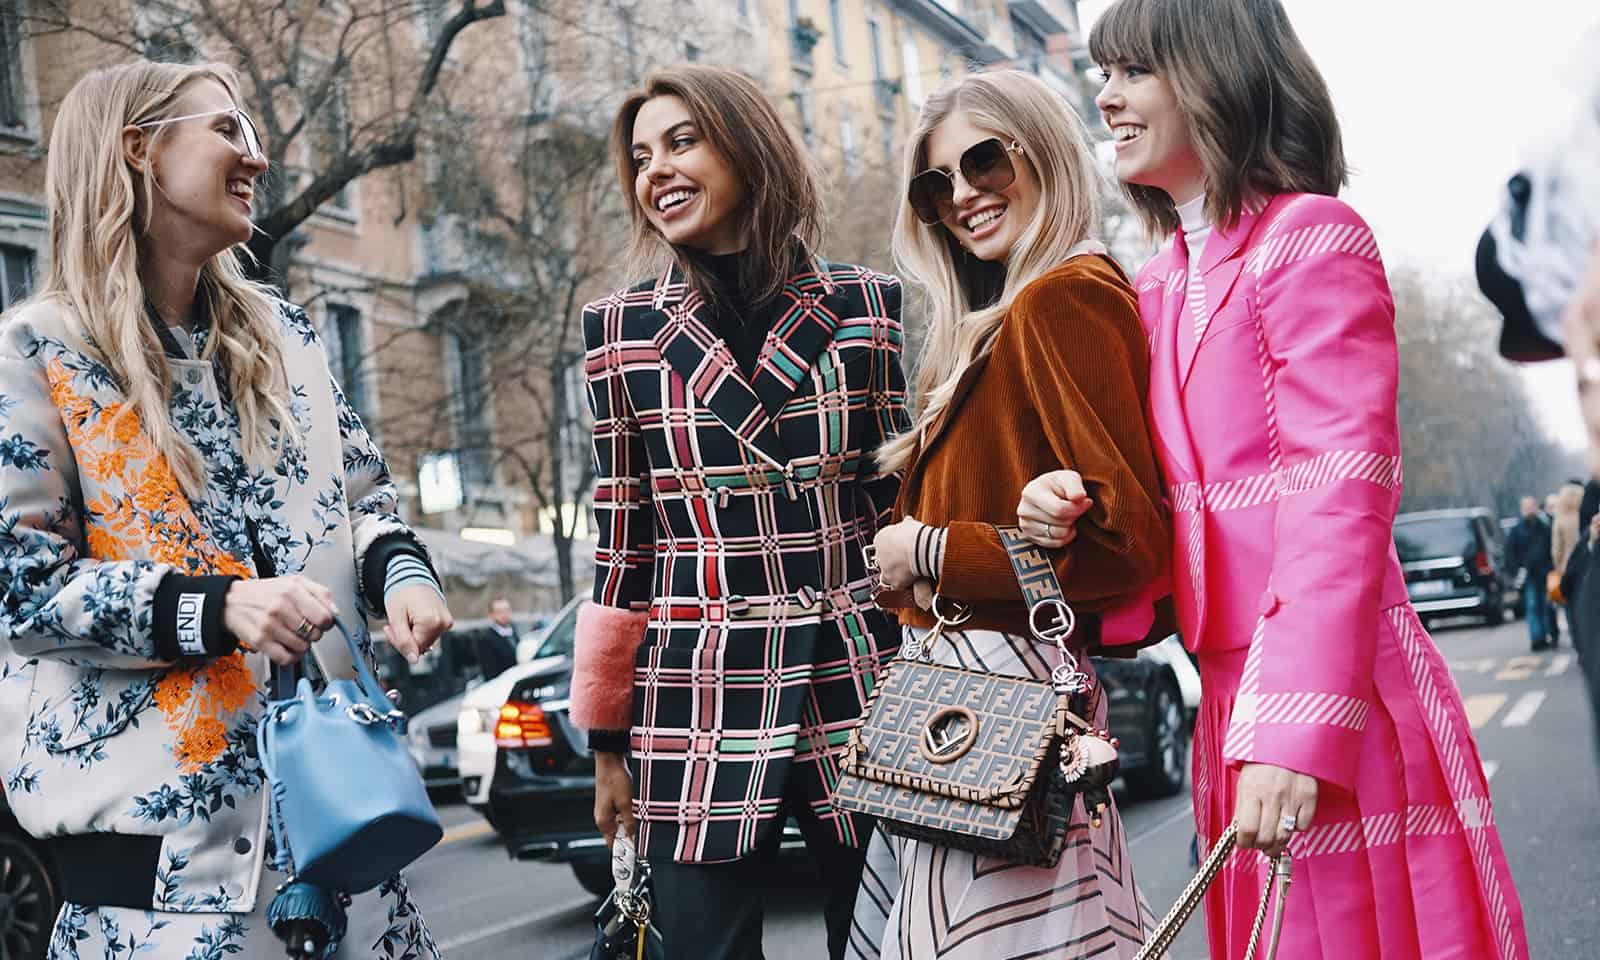 How-to-Make-Your-Wardrobe-Both-Functional-and-Fashionable-main-image-viva-glam-magazine